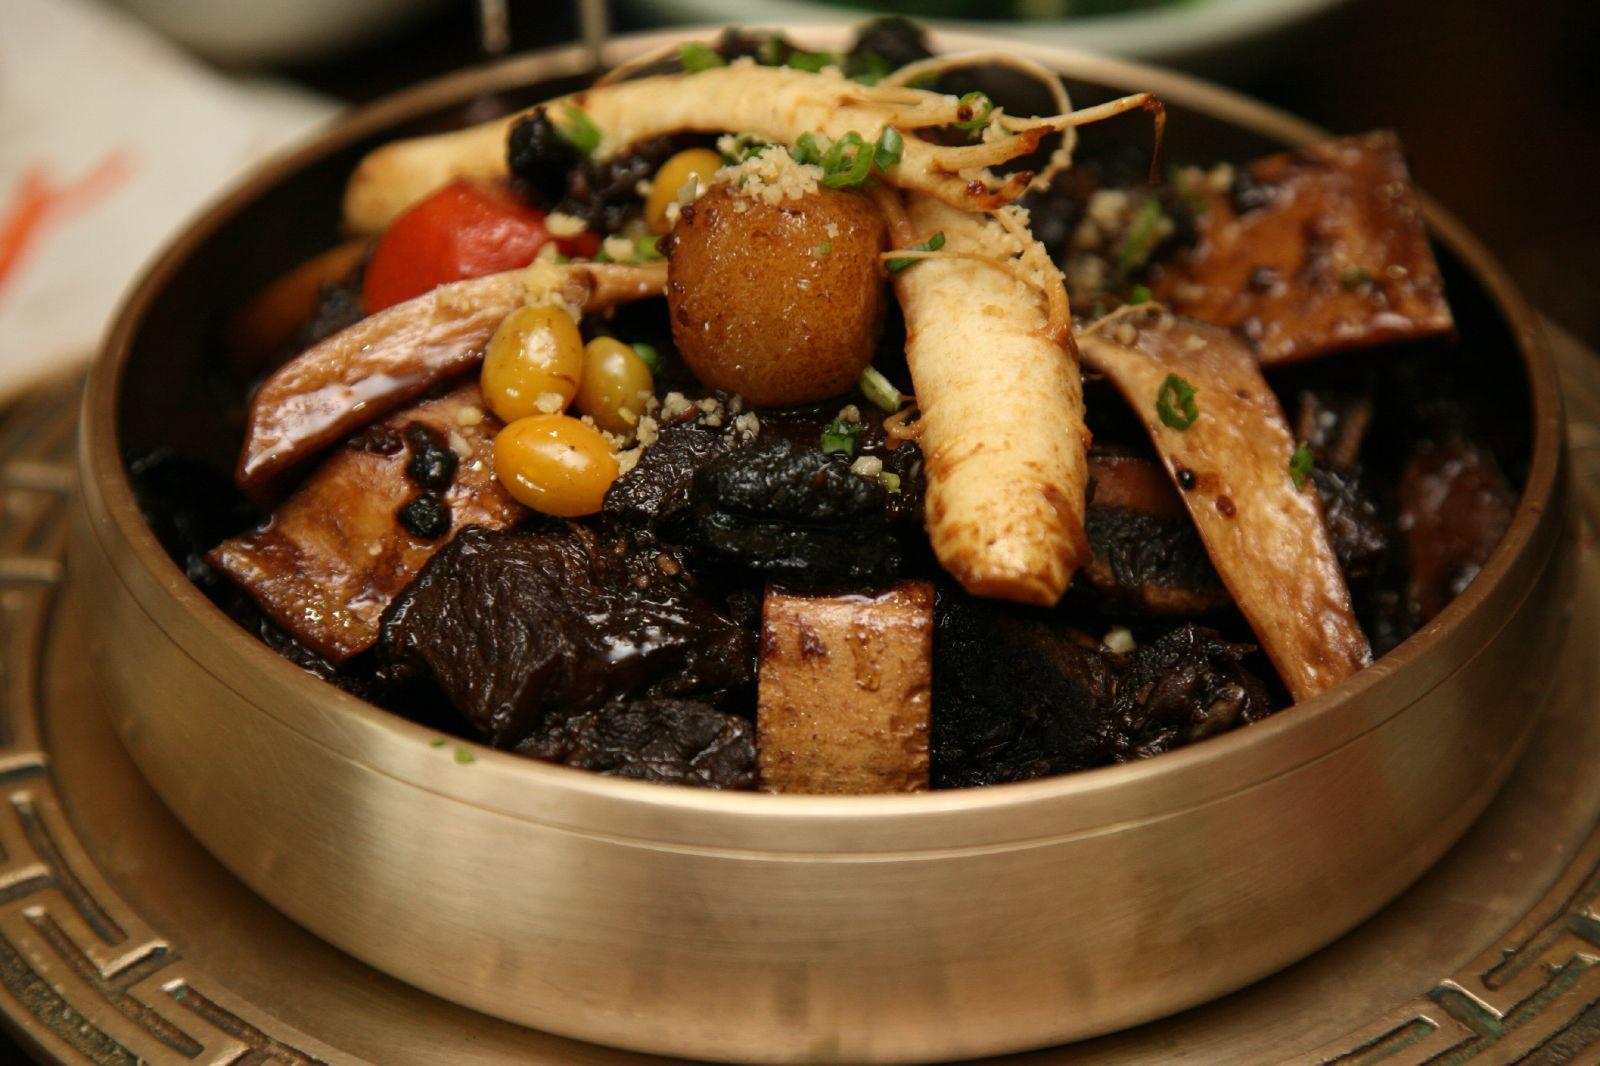 File:Korean braised beef short ribs-Galbijjim.jpg - Wikipedia, the ...